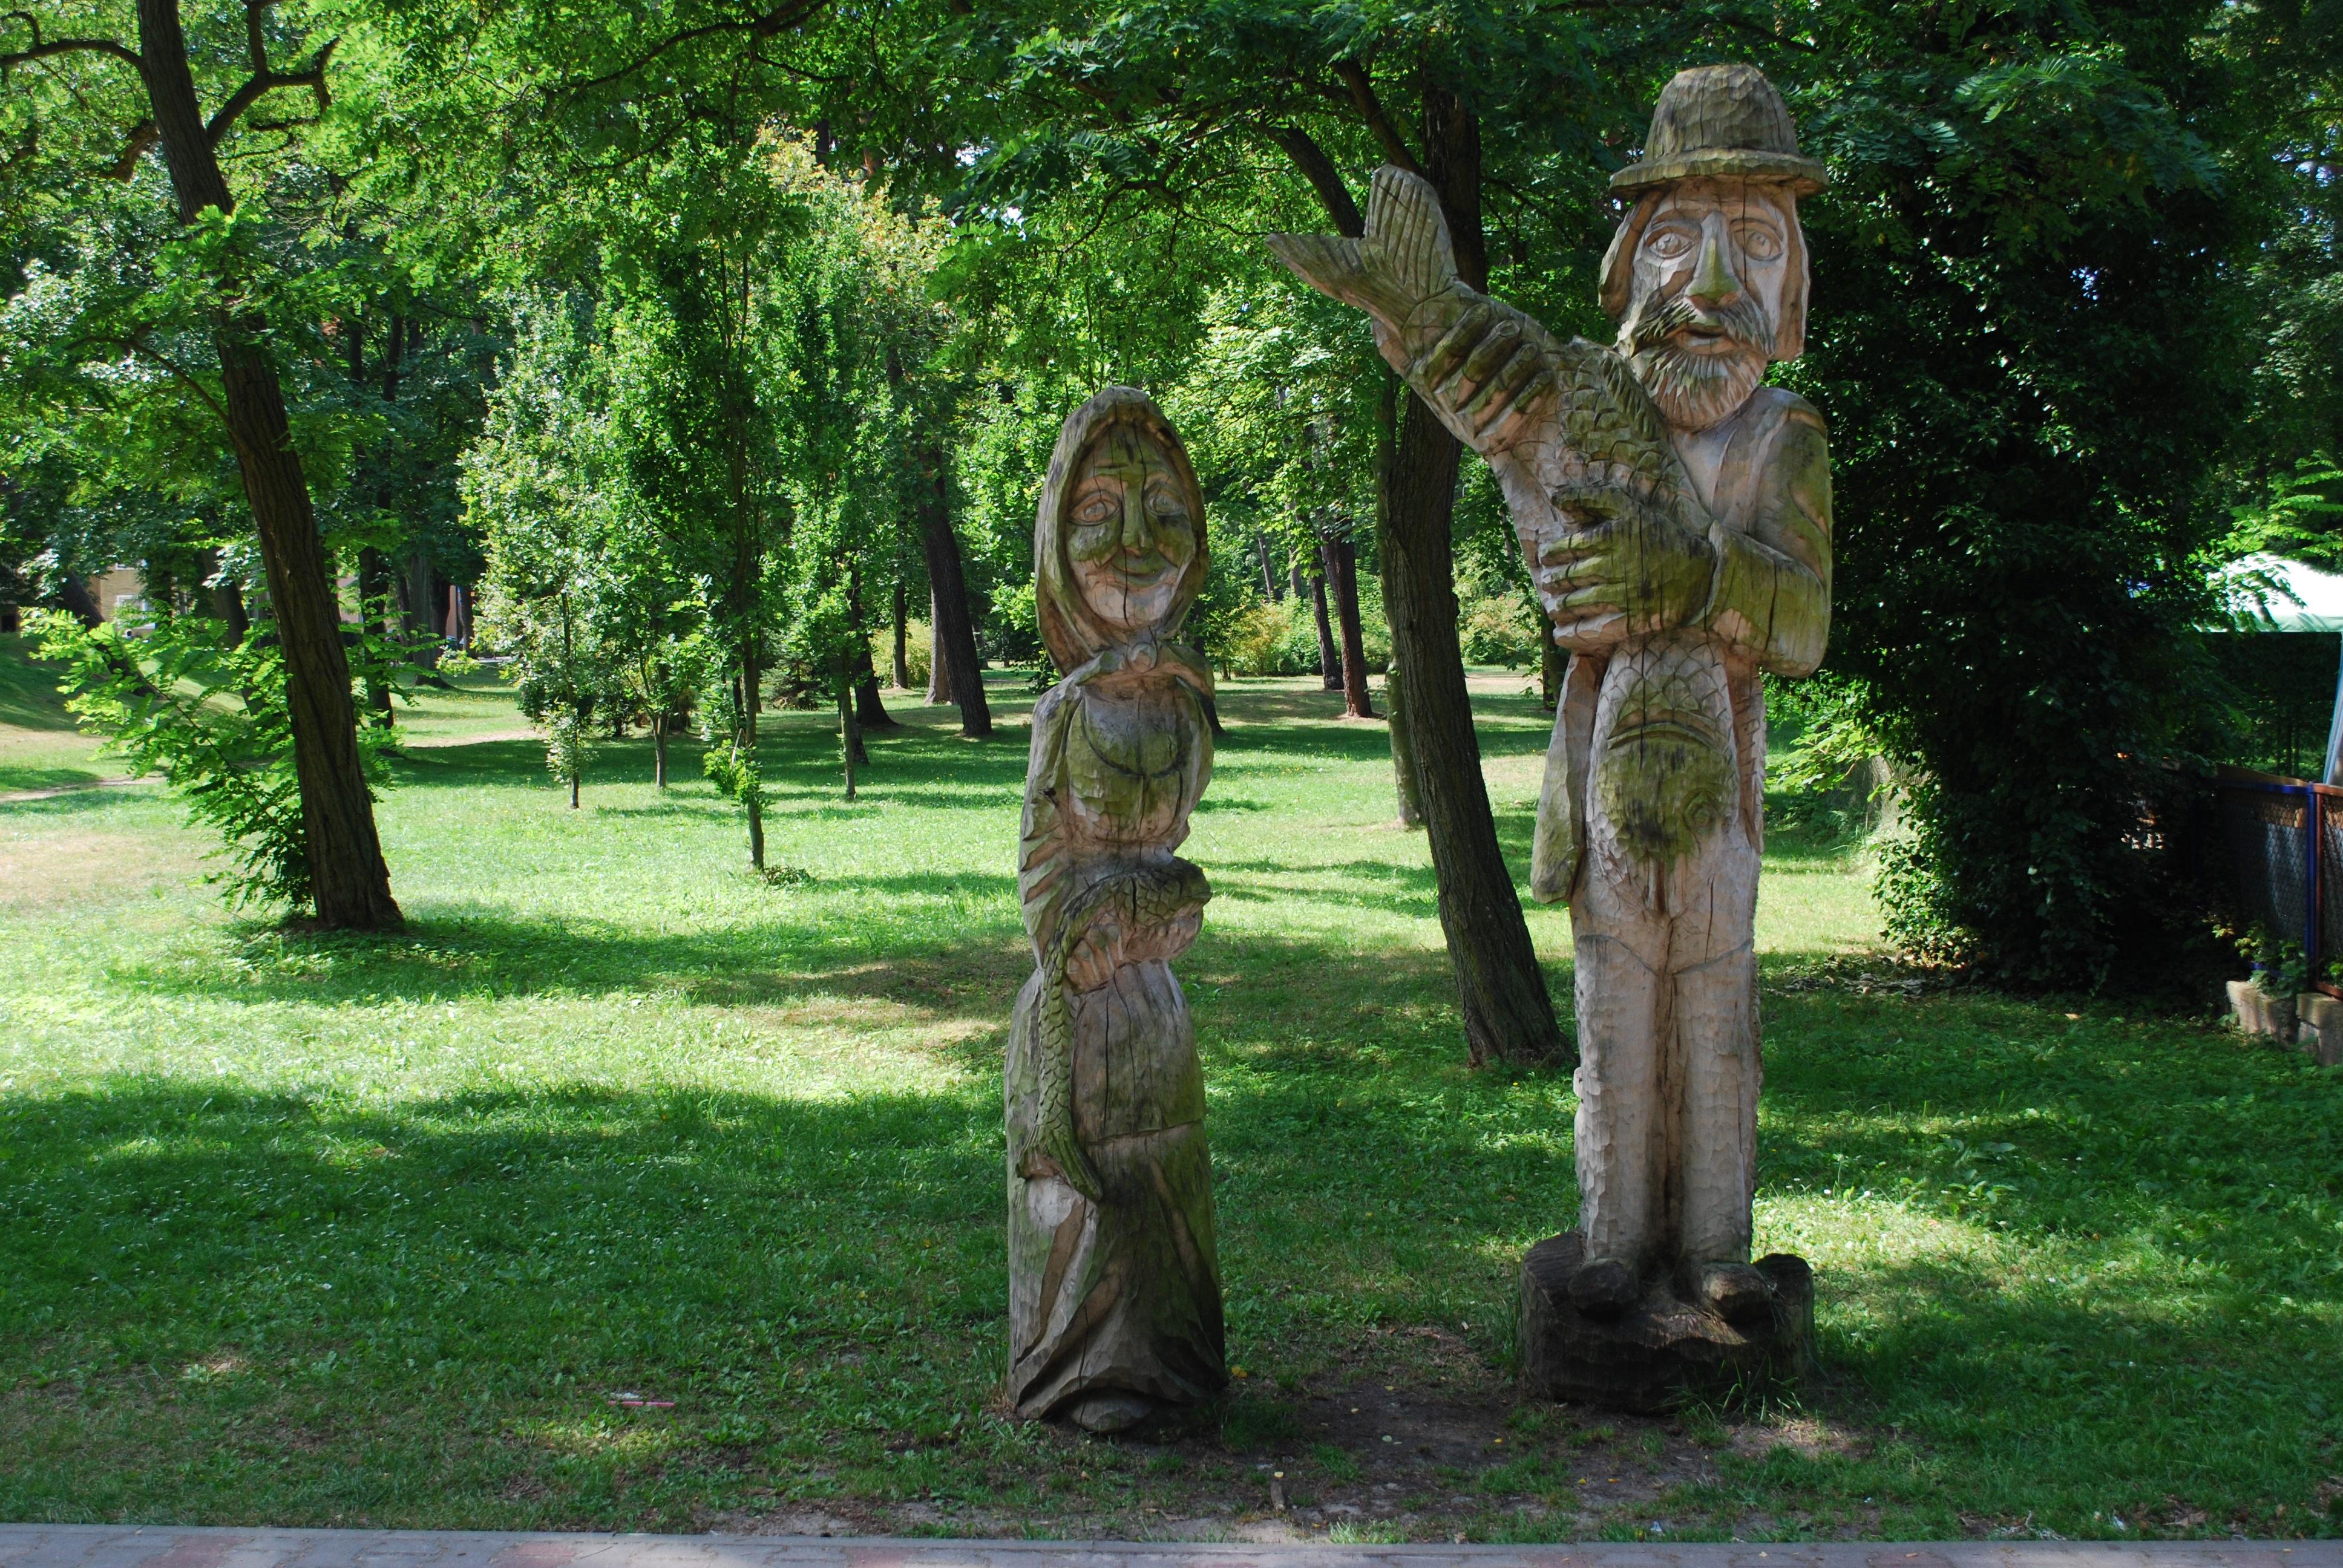 Free images : tree monument statue park garden sculpture